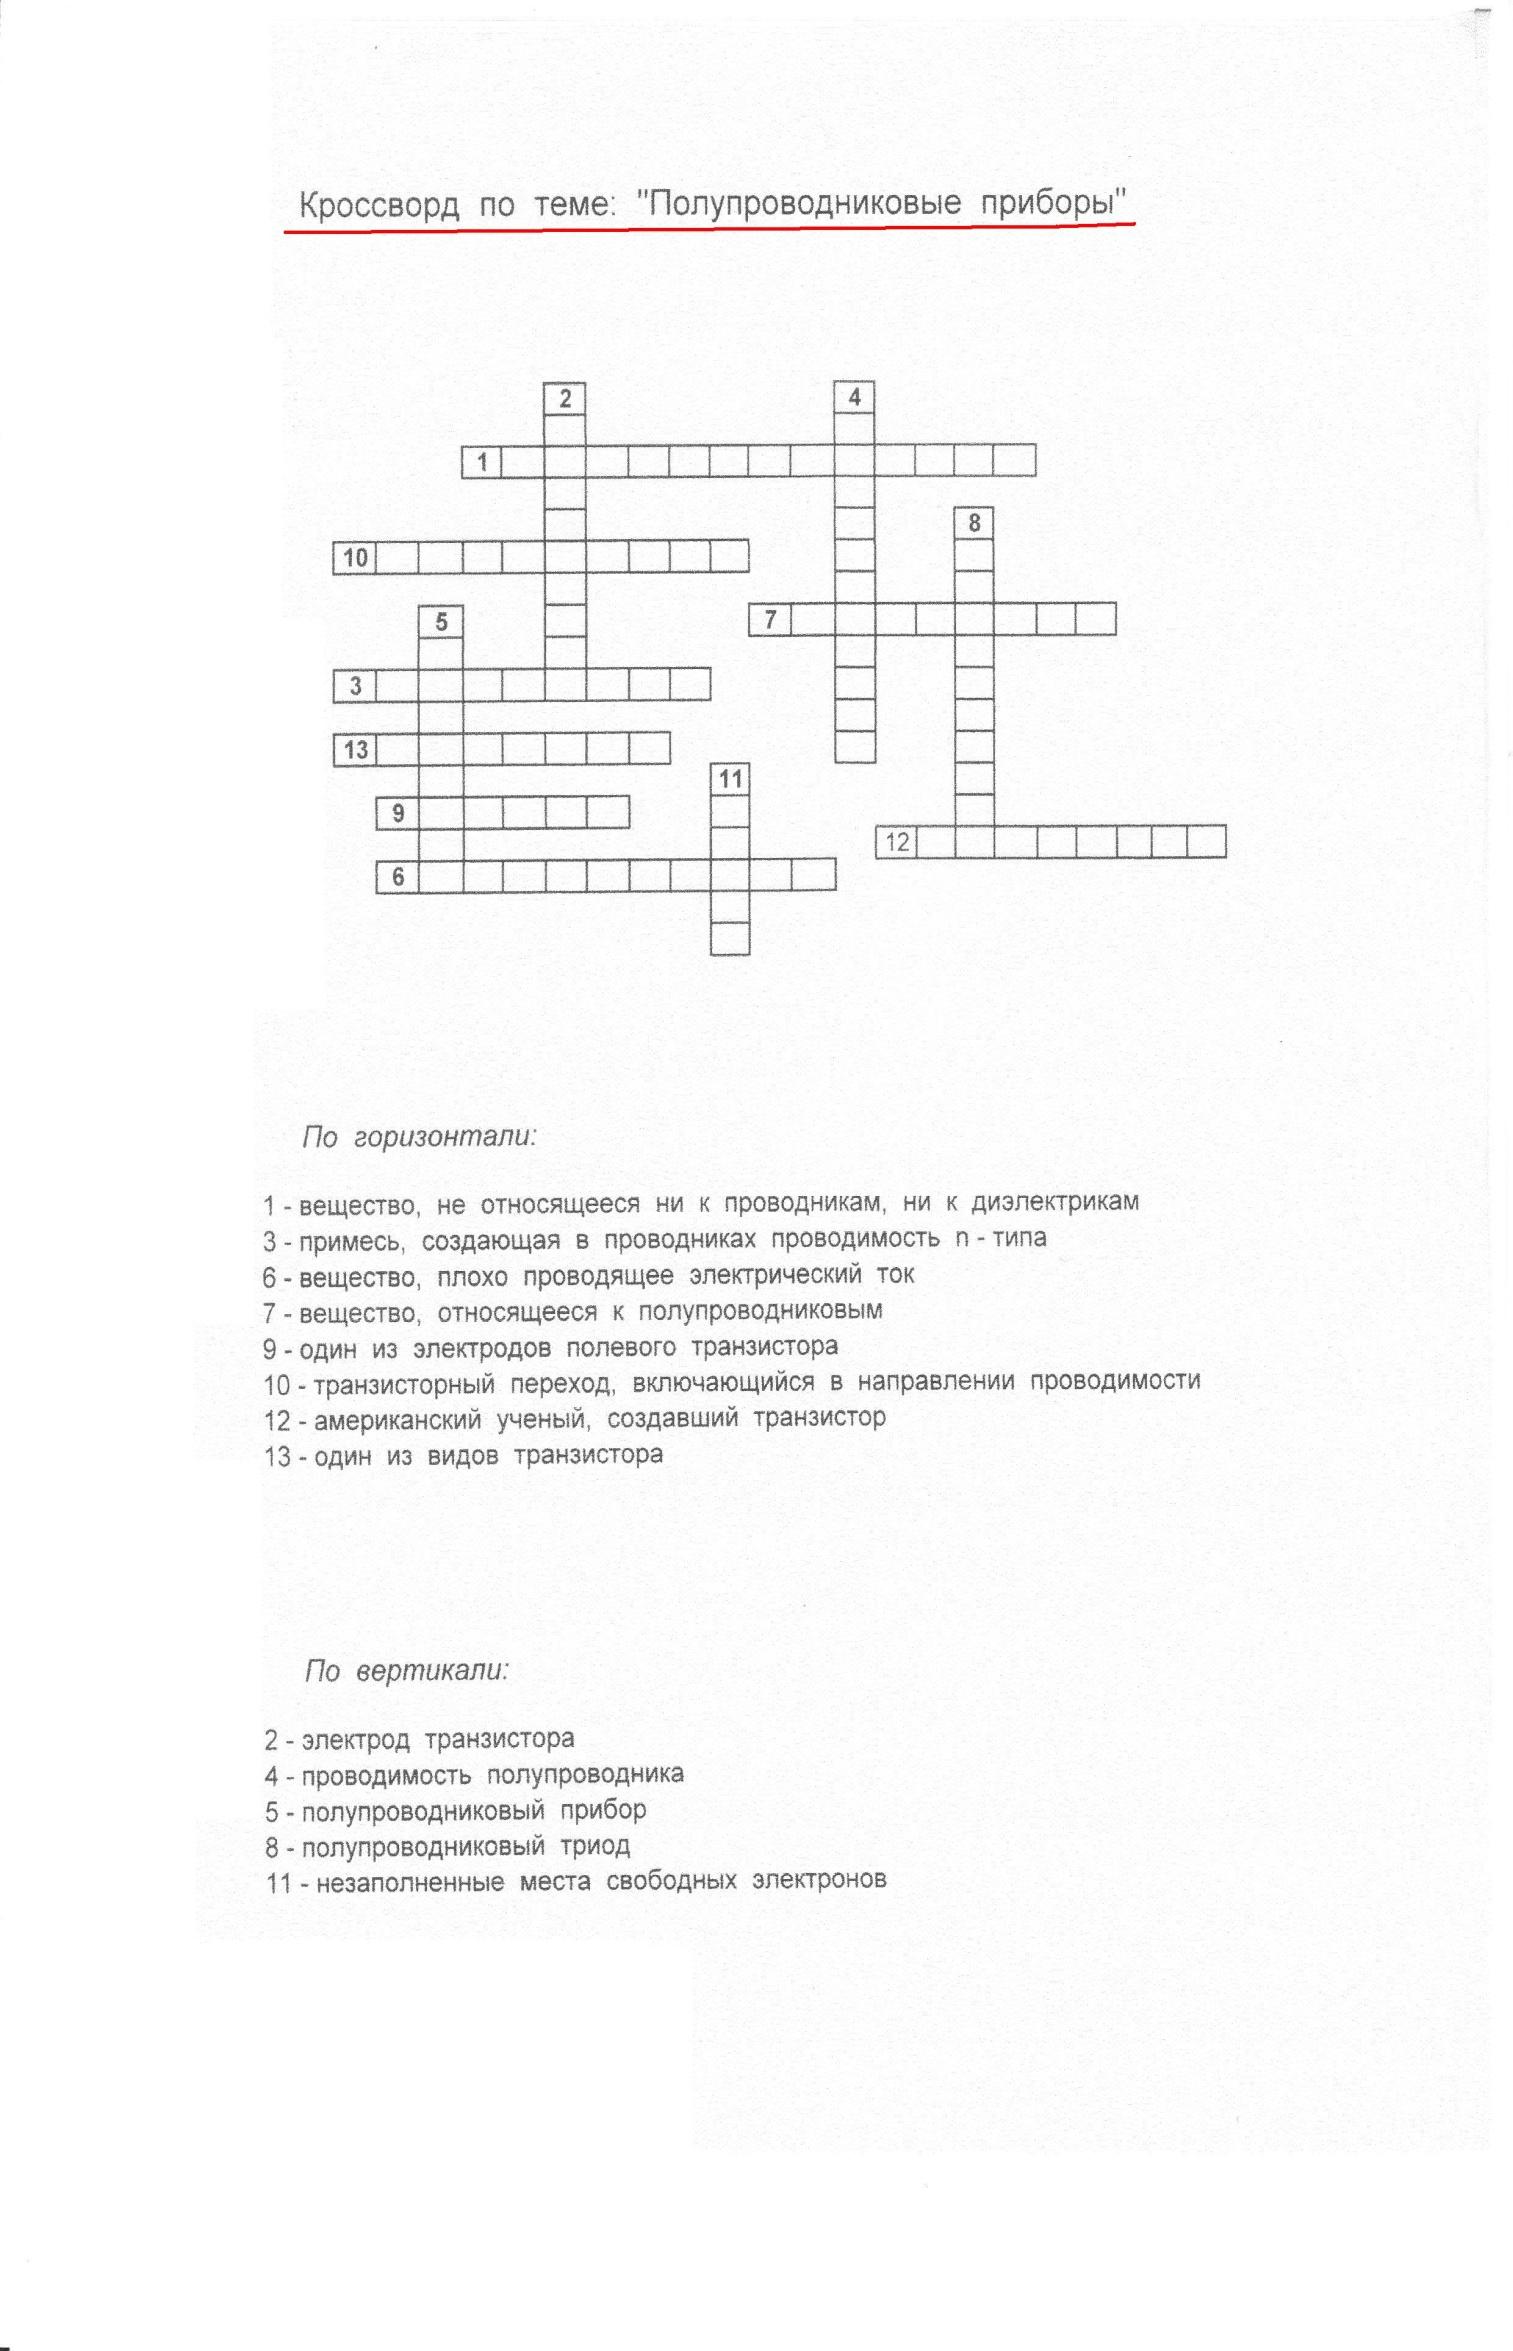 C:\Documents and Settings\UserXP\Мои документы\Мои рисунки\MP Navigator EX\кроссворды\IMG_0007.jpg